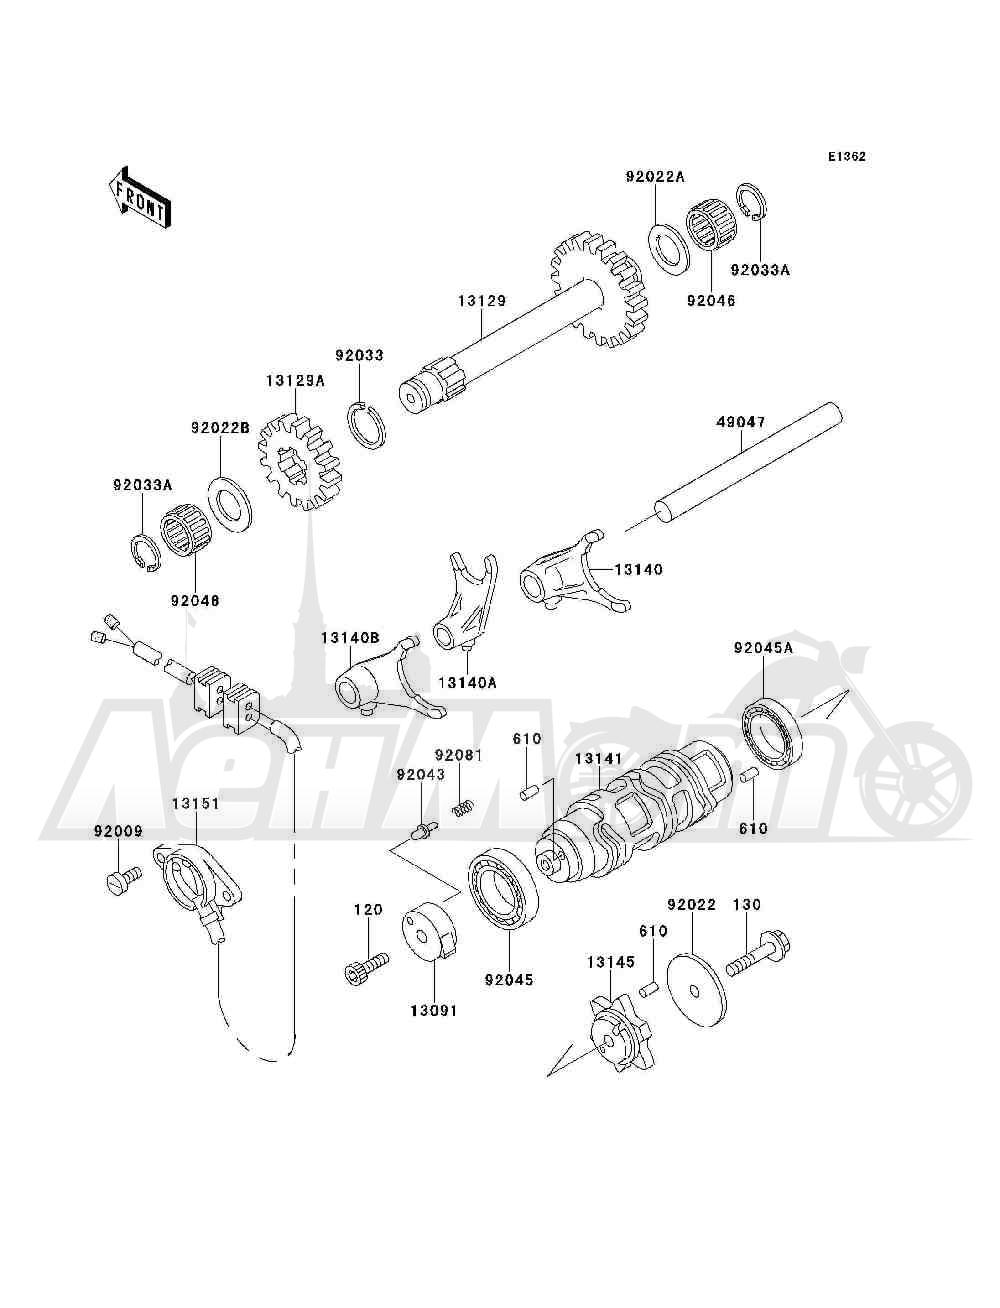 Запчасти для Квадроцикла Kawasaki 1993 BAYOU 300 4X4 (KLF300-C5) Раздел: GEAR CHANGE DRUM / SHIFT FORK(S) | переключение передач барабан/вилка переключения (S)